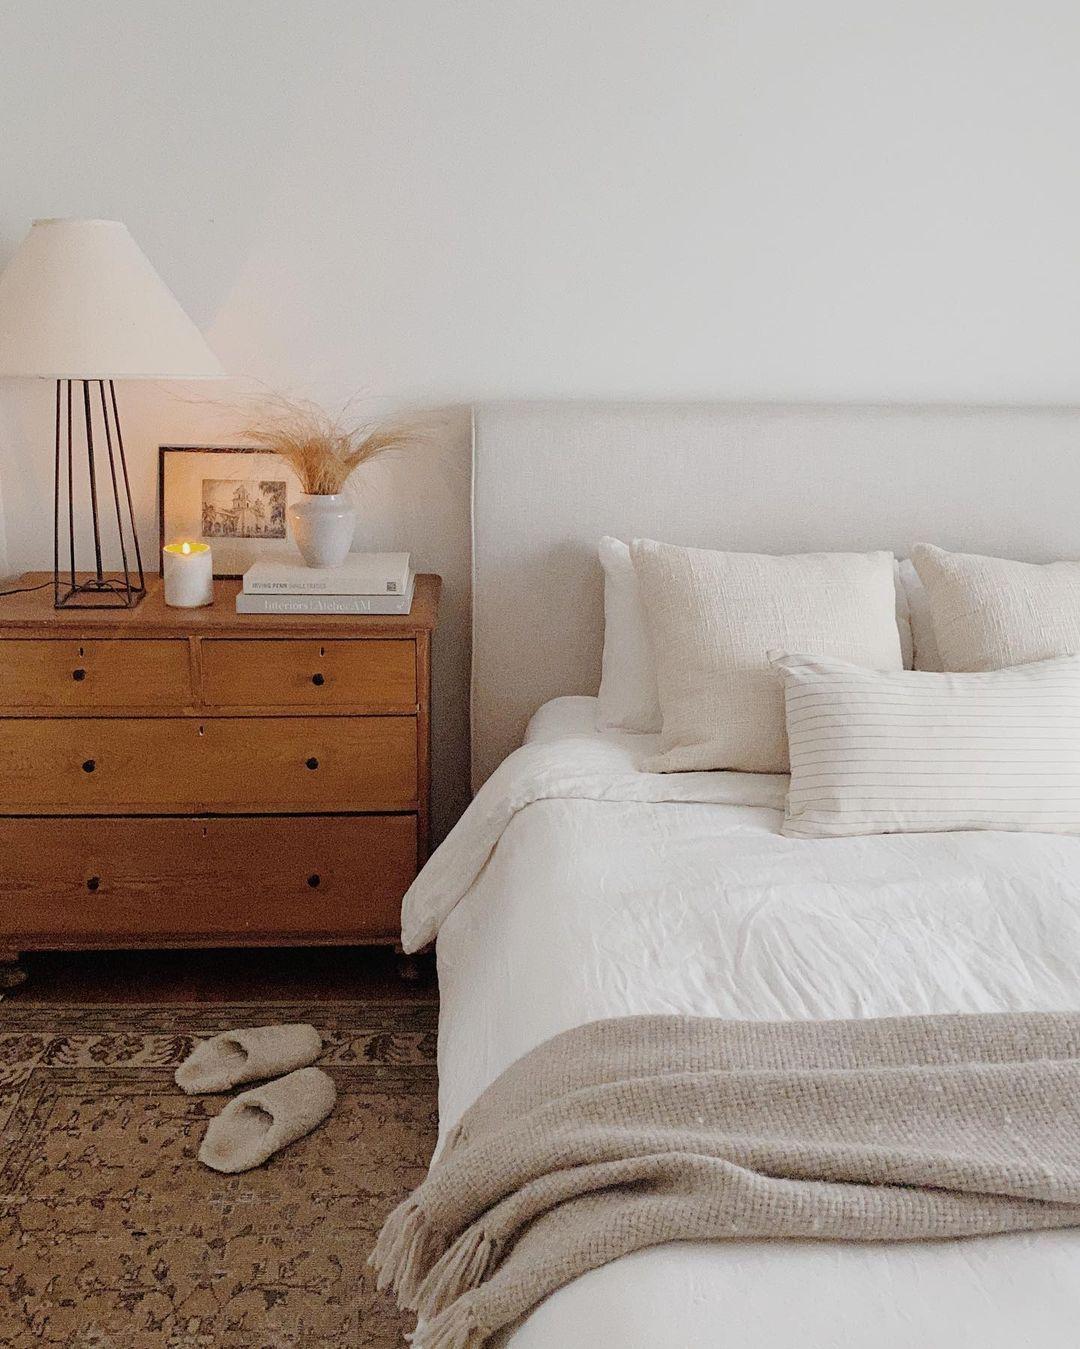 "TESSA NEUSTADT on Instagram: ""mini bedroom refresh"